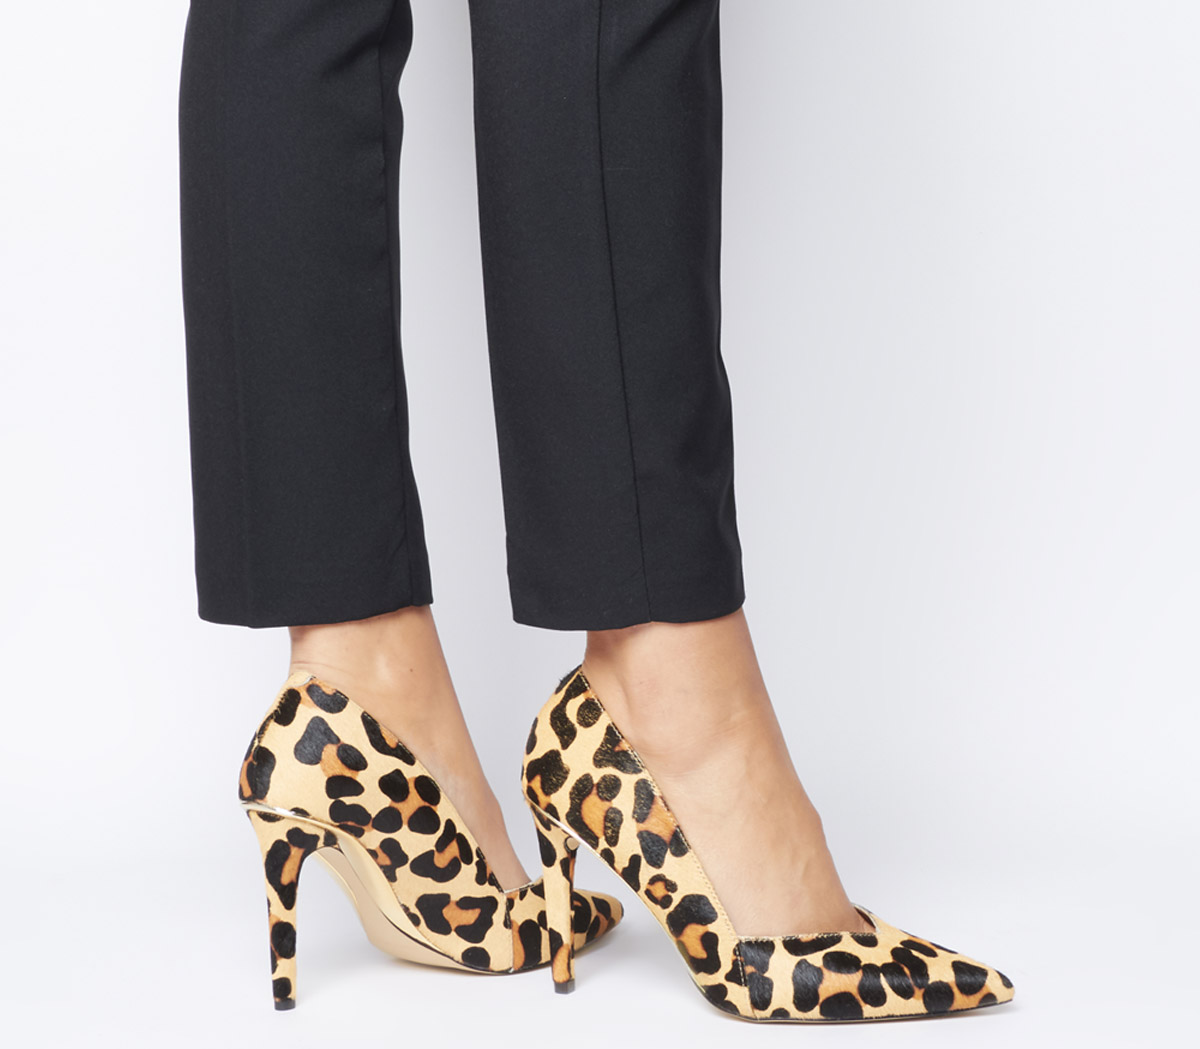 nueva llegada f1f21 d4b88 Detalles de Mujer office Harlequinn Cintura Tribunal Tacones Leopardo Pony  con Oro Tacones